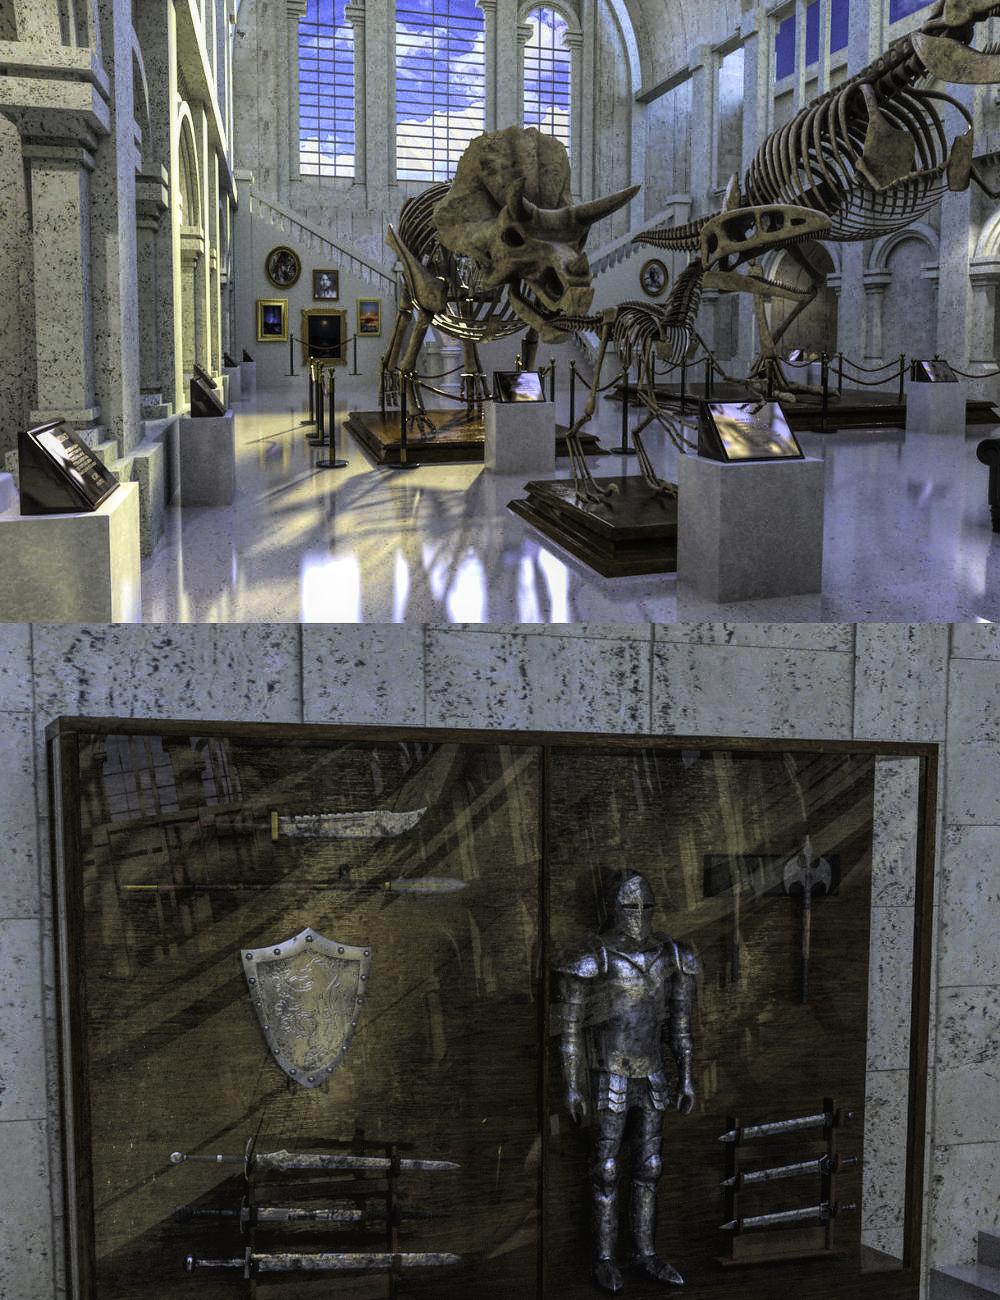 FG Museum by: Fugazi1968, 3D Models by Daz 3D